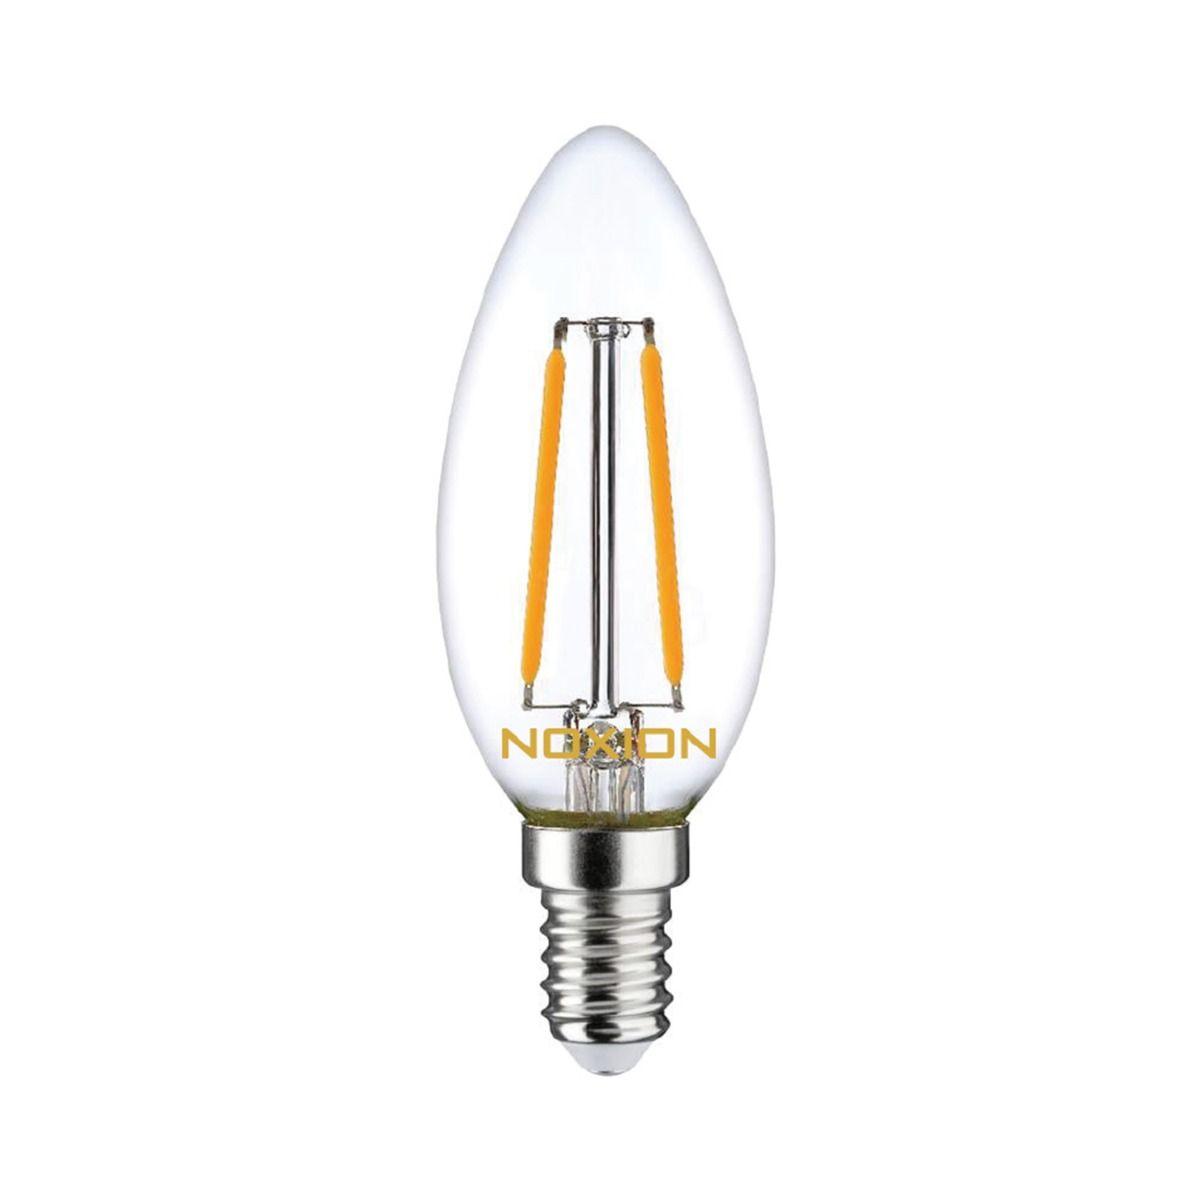 Noxion Lucent con Filamento LED Candle 2.5W 827 B35 E14 Clara | Luz muy Cálida - Reemplazo 25W